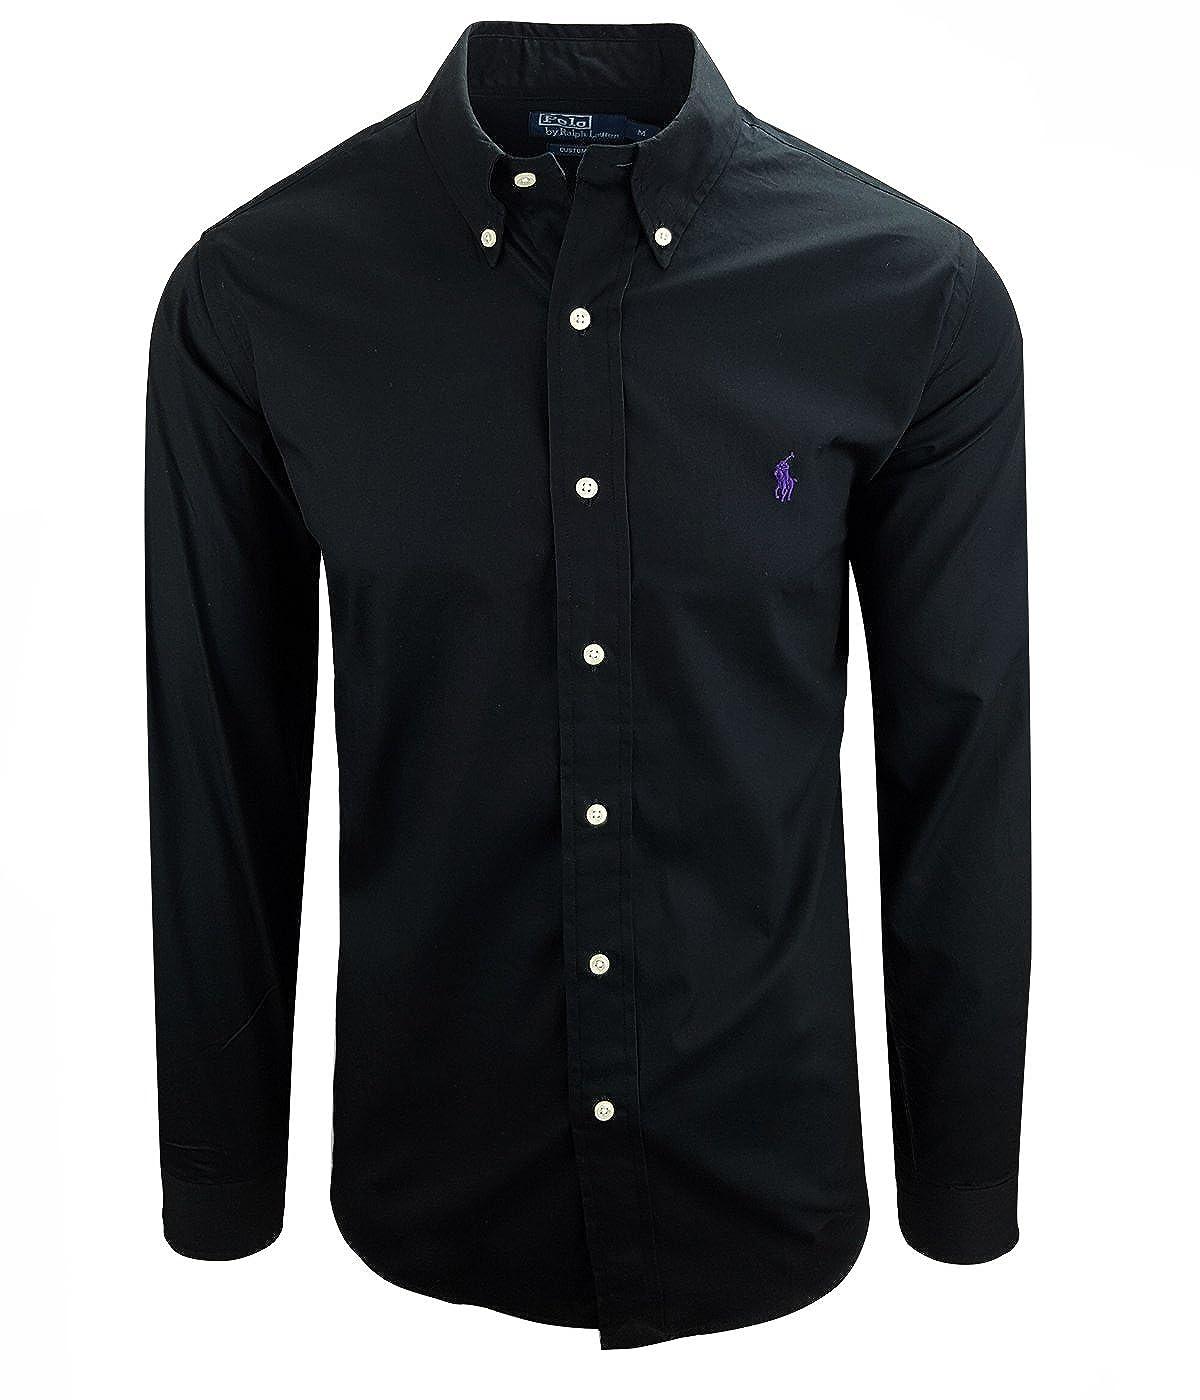 Ralph Lauren Herren Hemd Classic Custom Fit S-M-L-XL Farbe:Schwarz Grö ß e:S